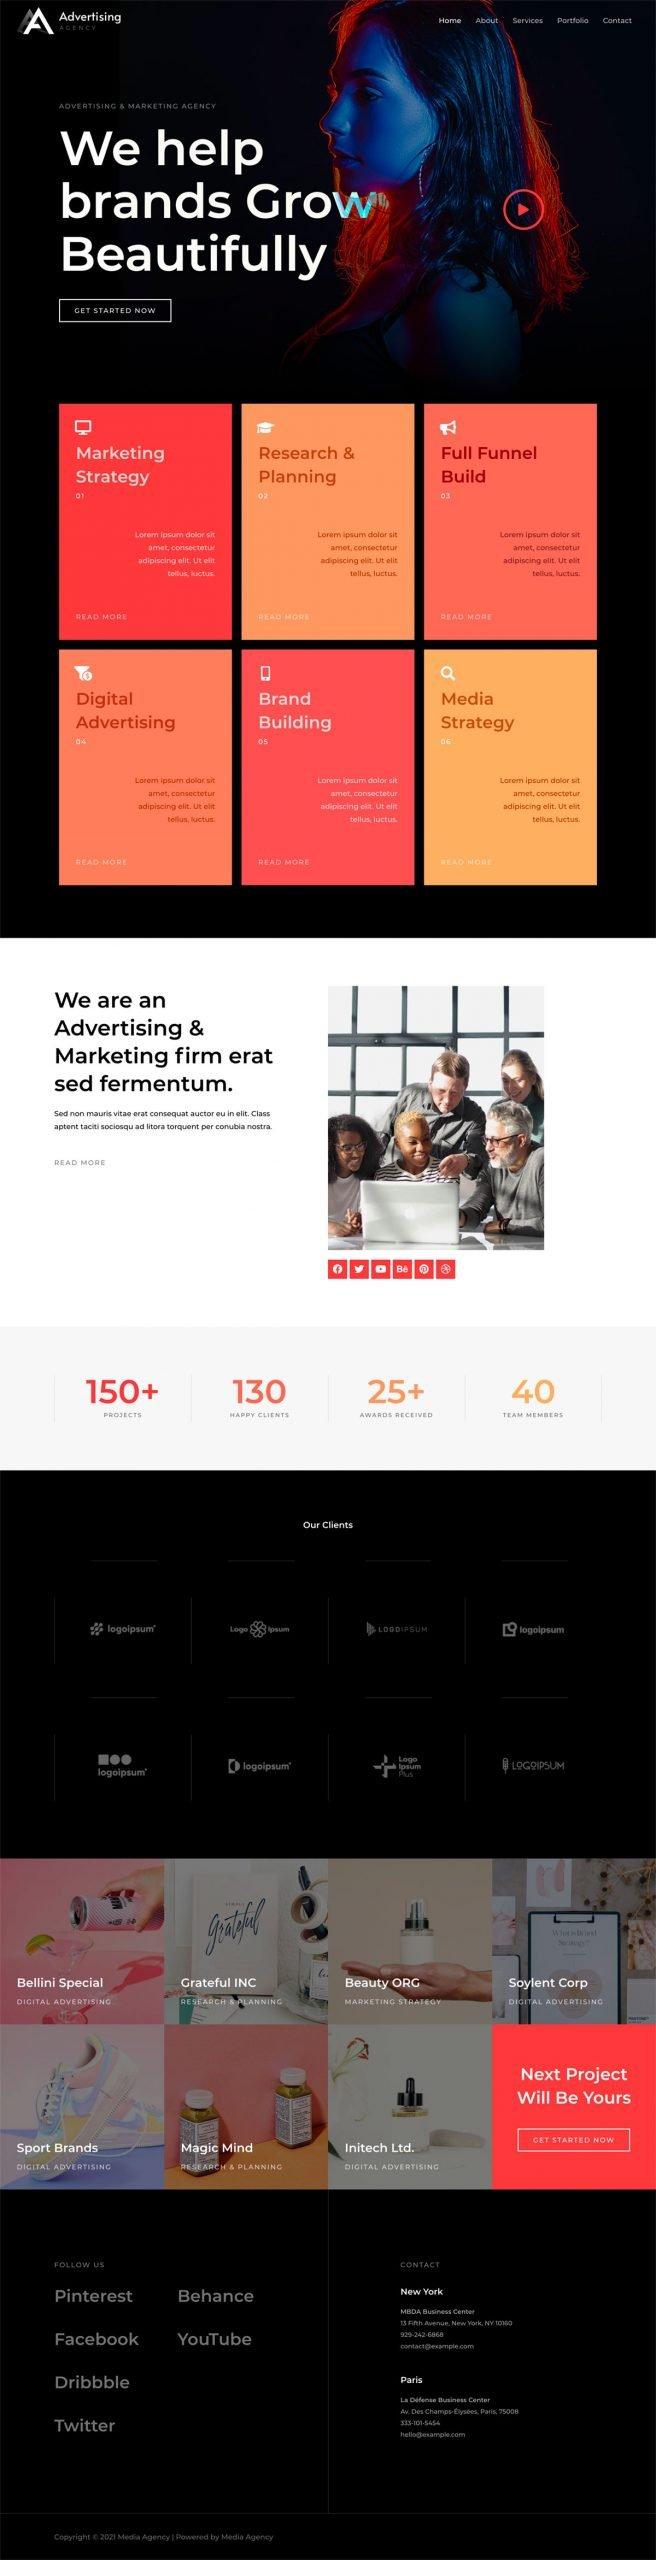 Adamo Web Design | Web Design Durham | media agency 04 home scaled